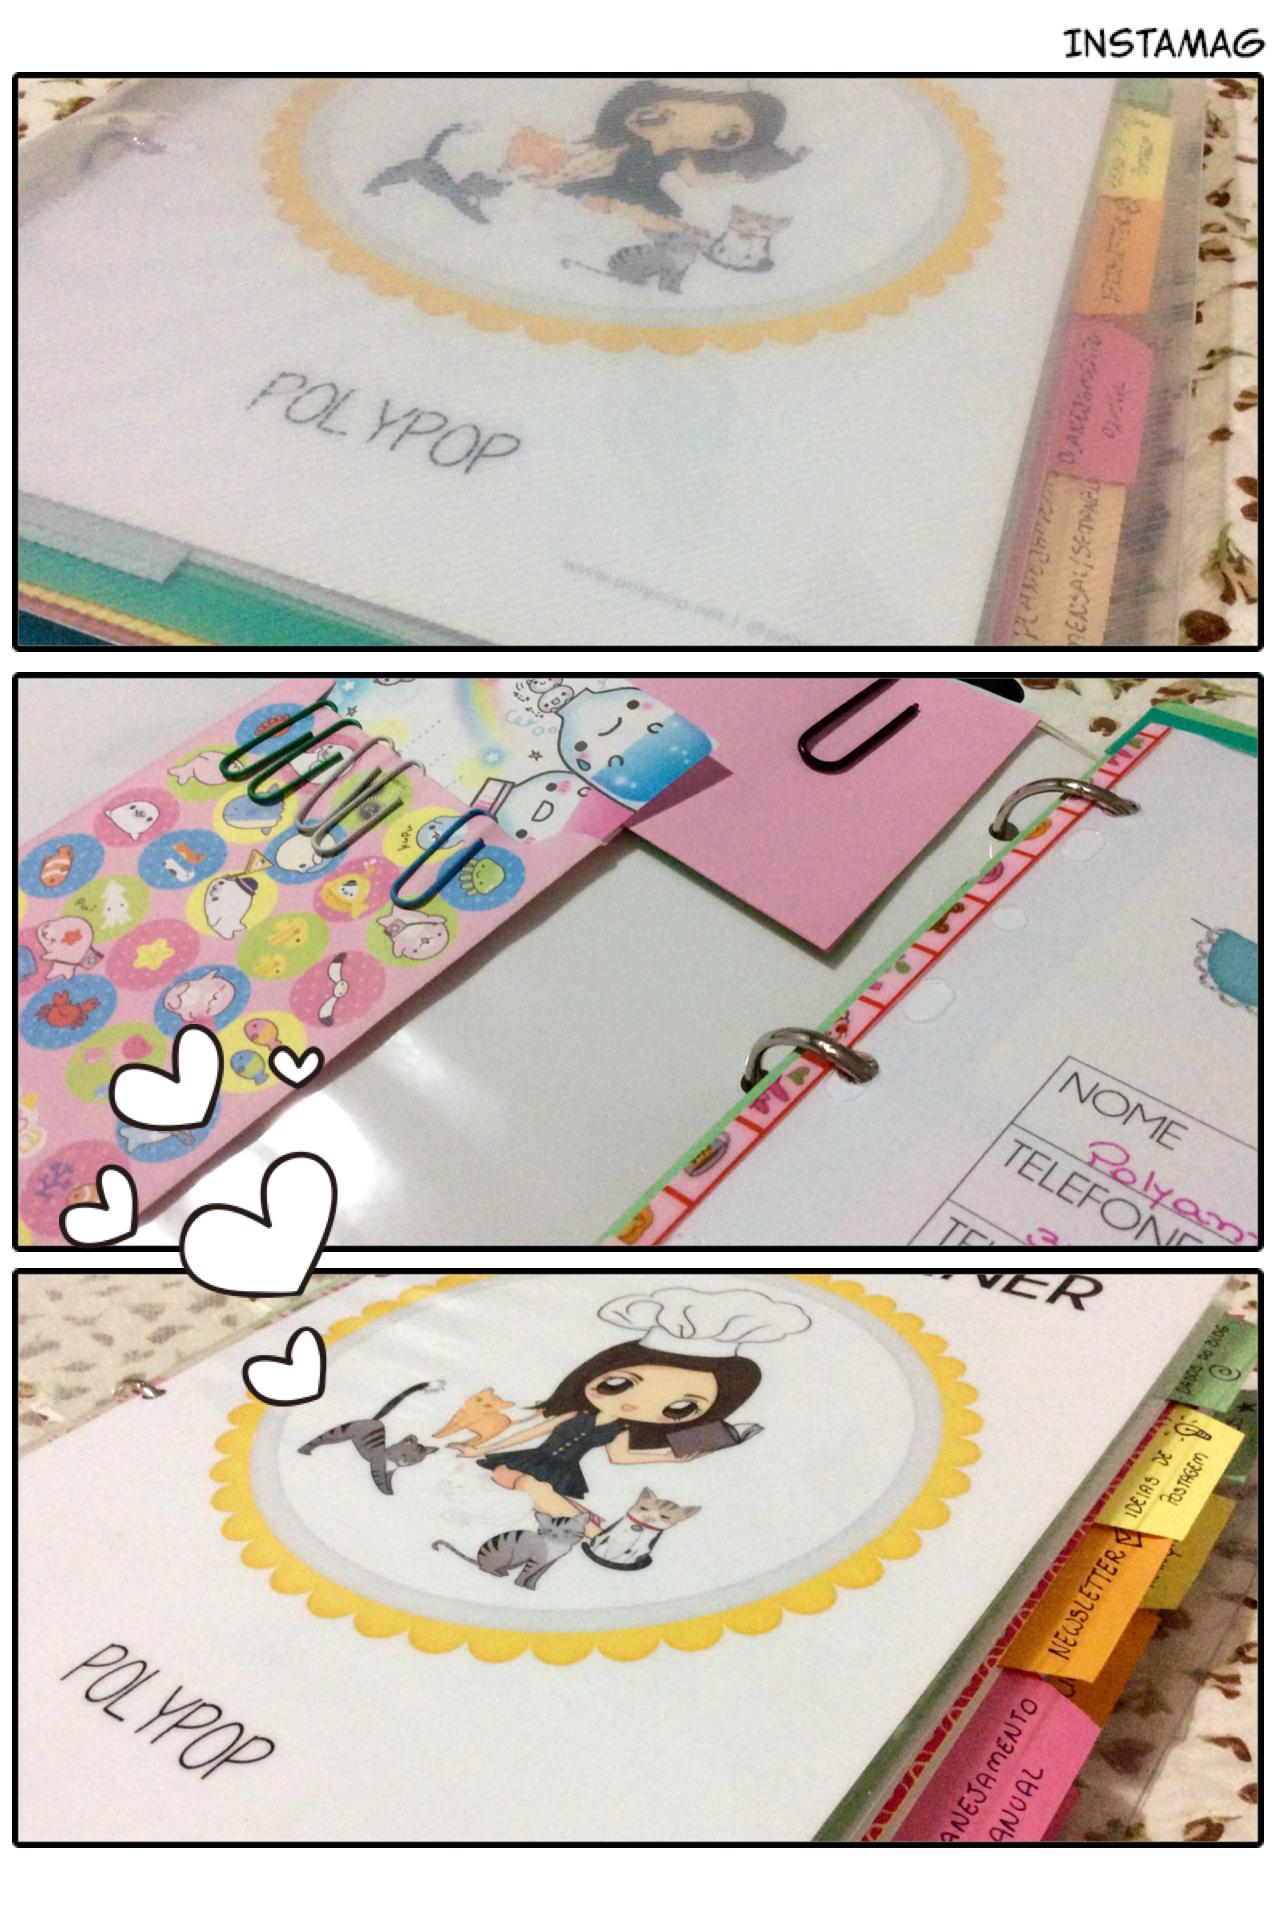 blogplanner-polypop1